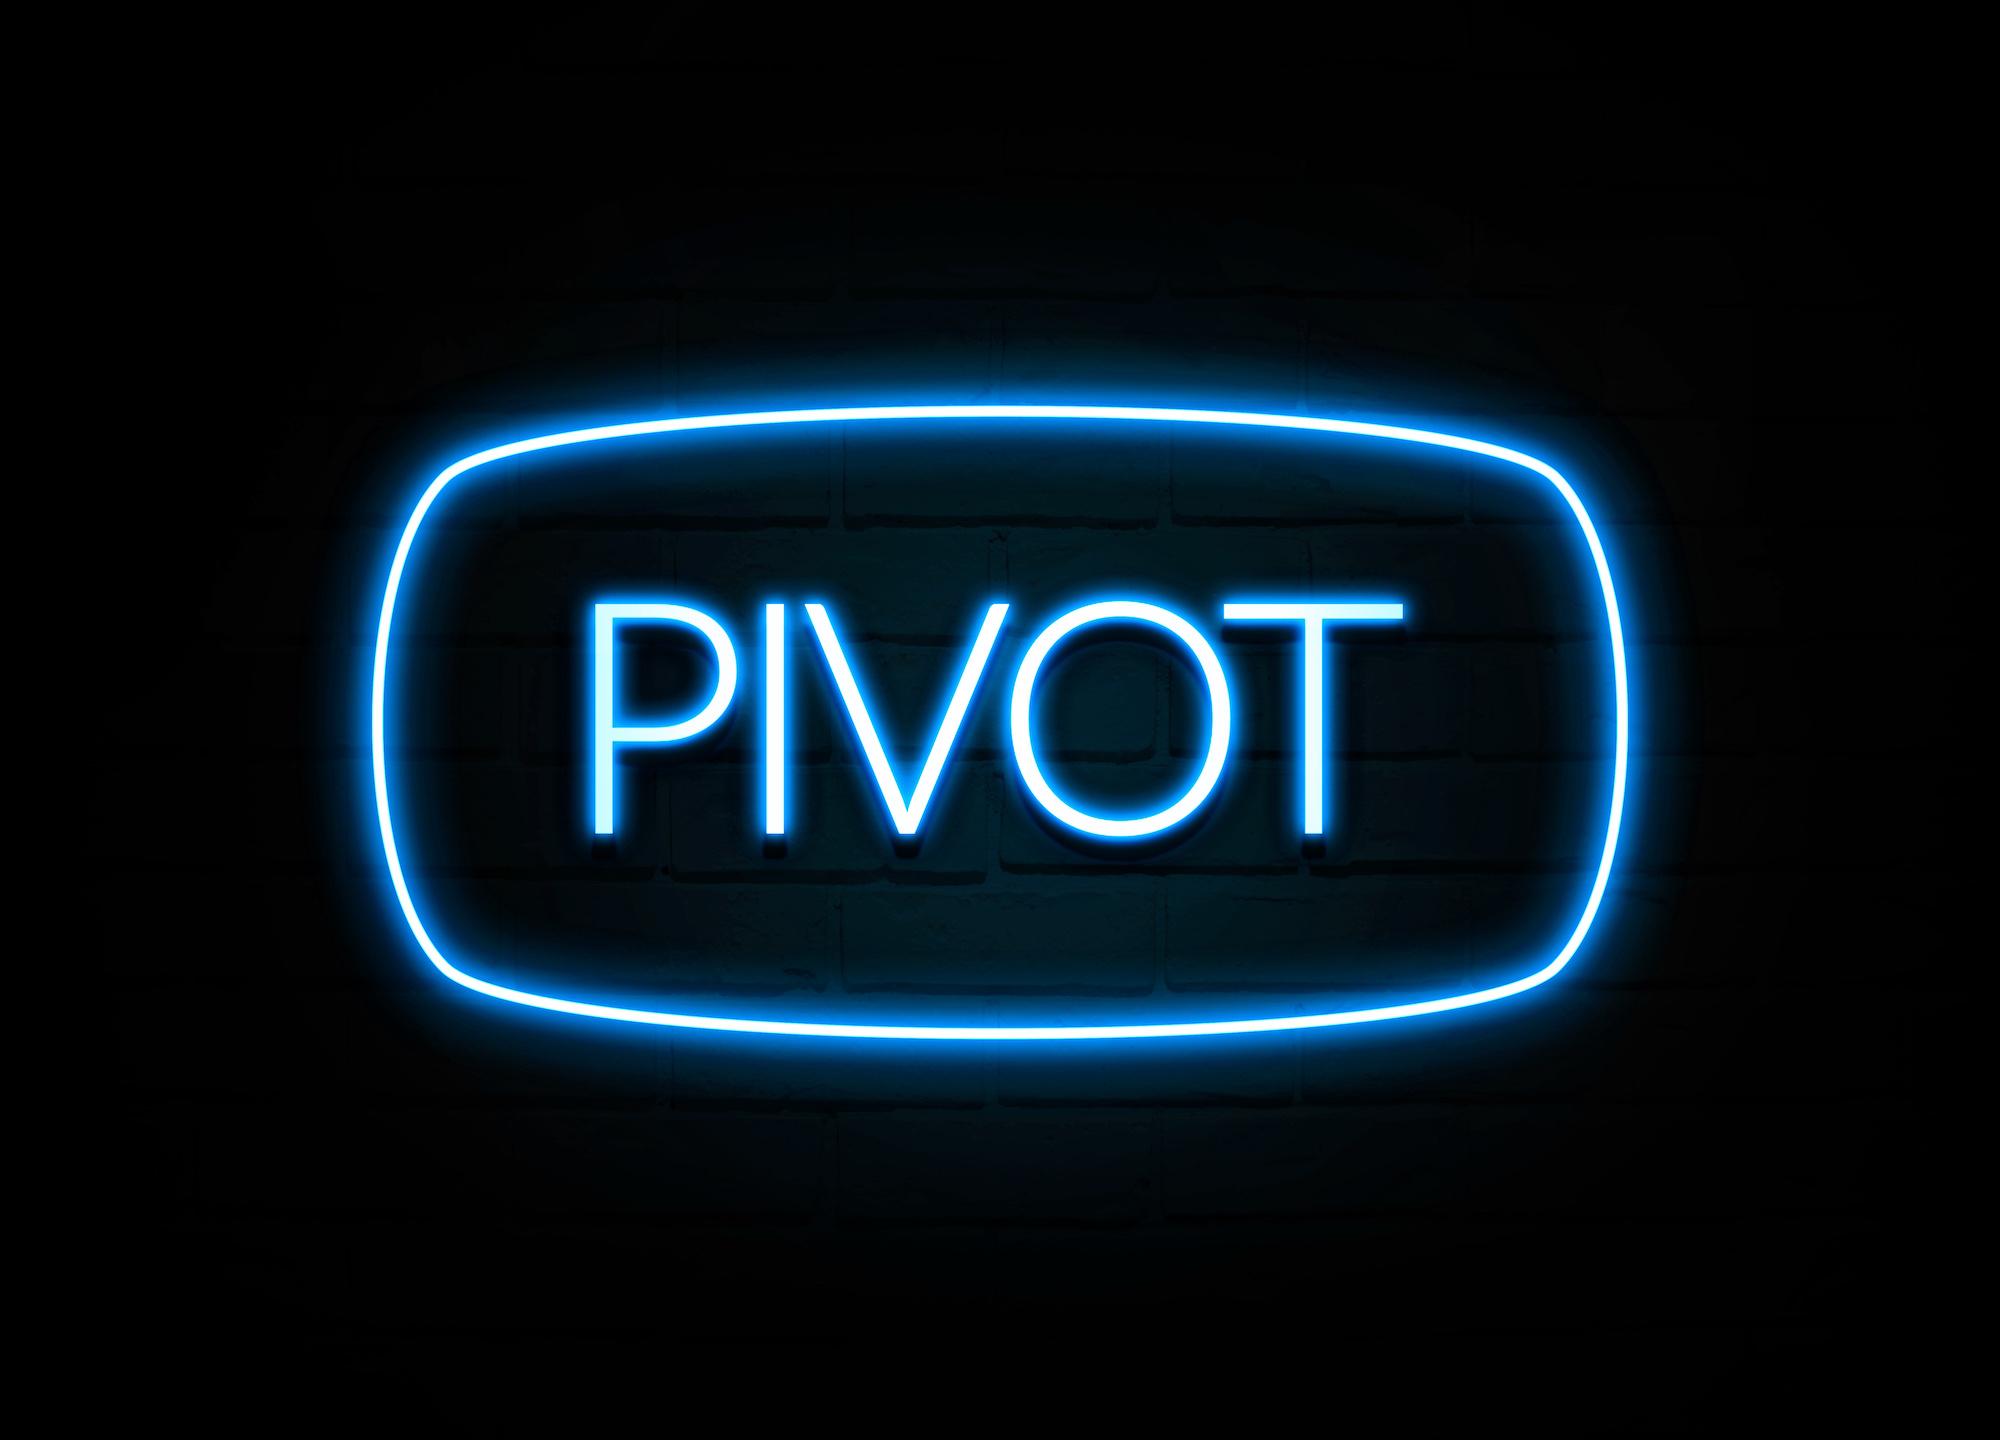 pivot neon sign